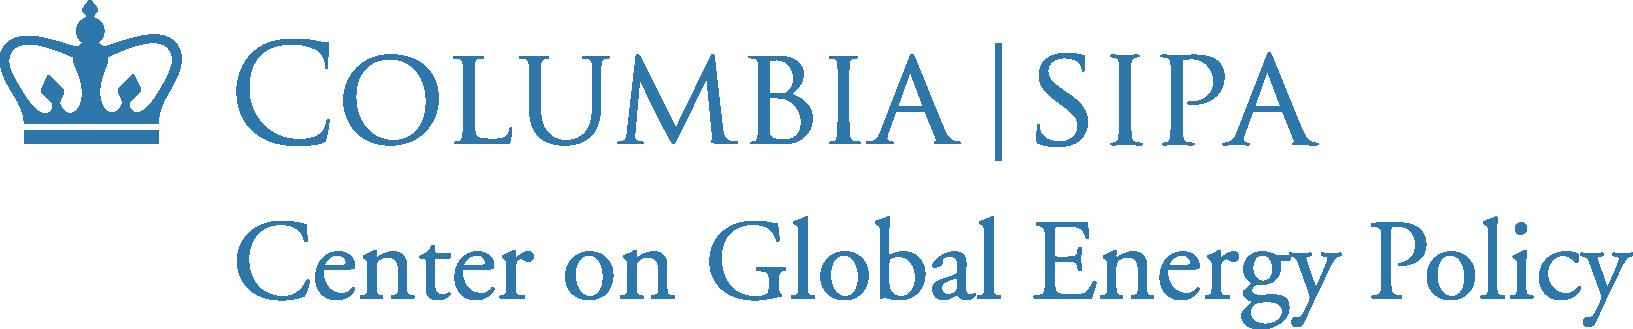 ColumbiaCGEP_Logo_CMYK.png